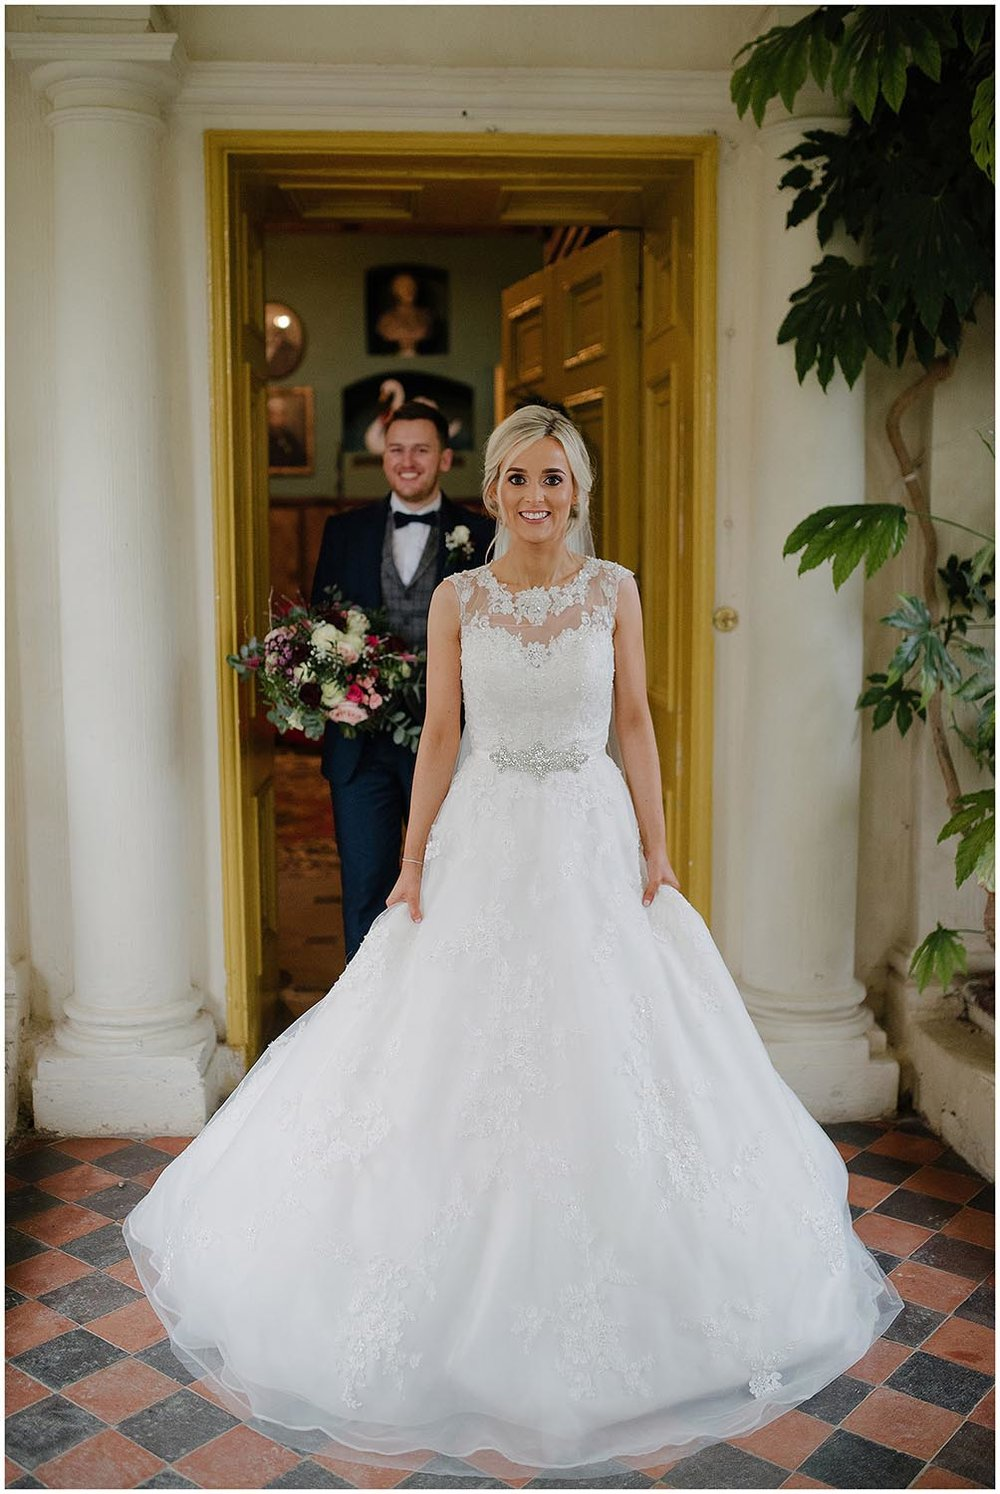 Irish-wedding-photographer-jude-browne-photography_0318.JPG